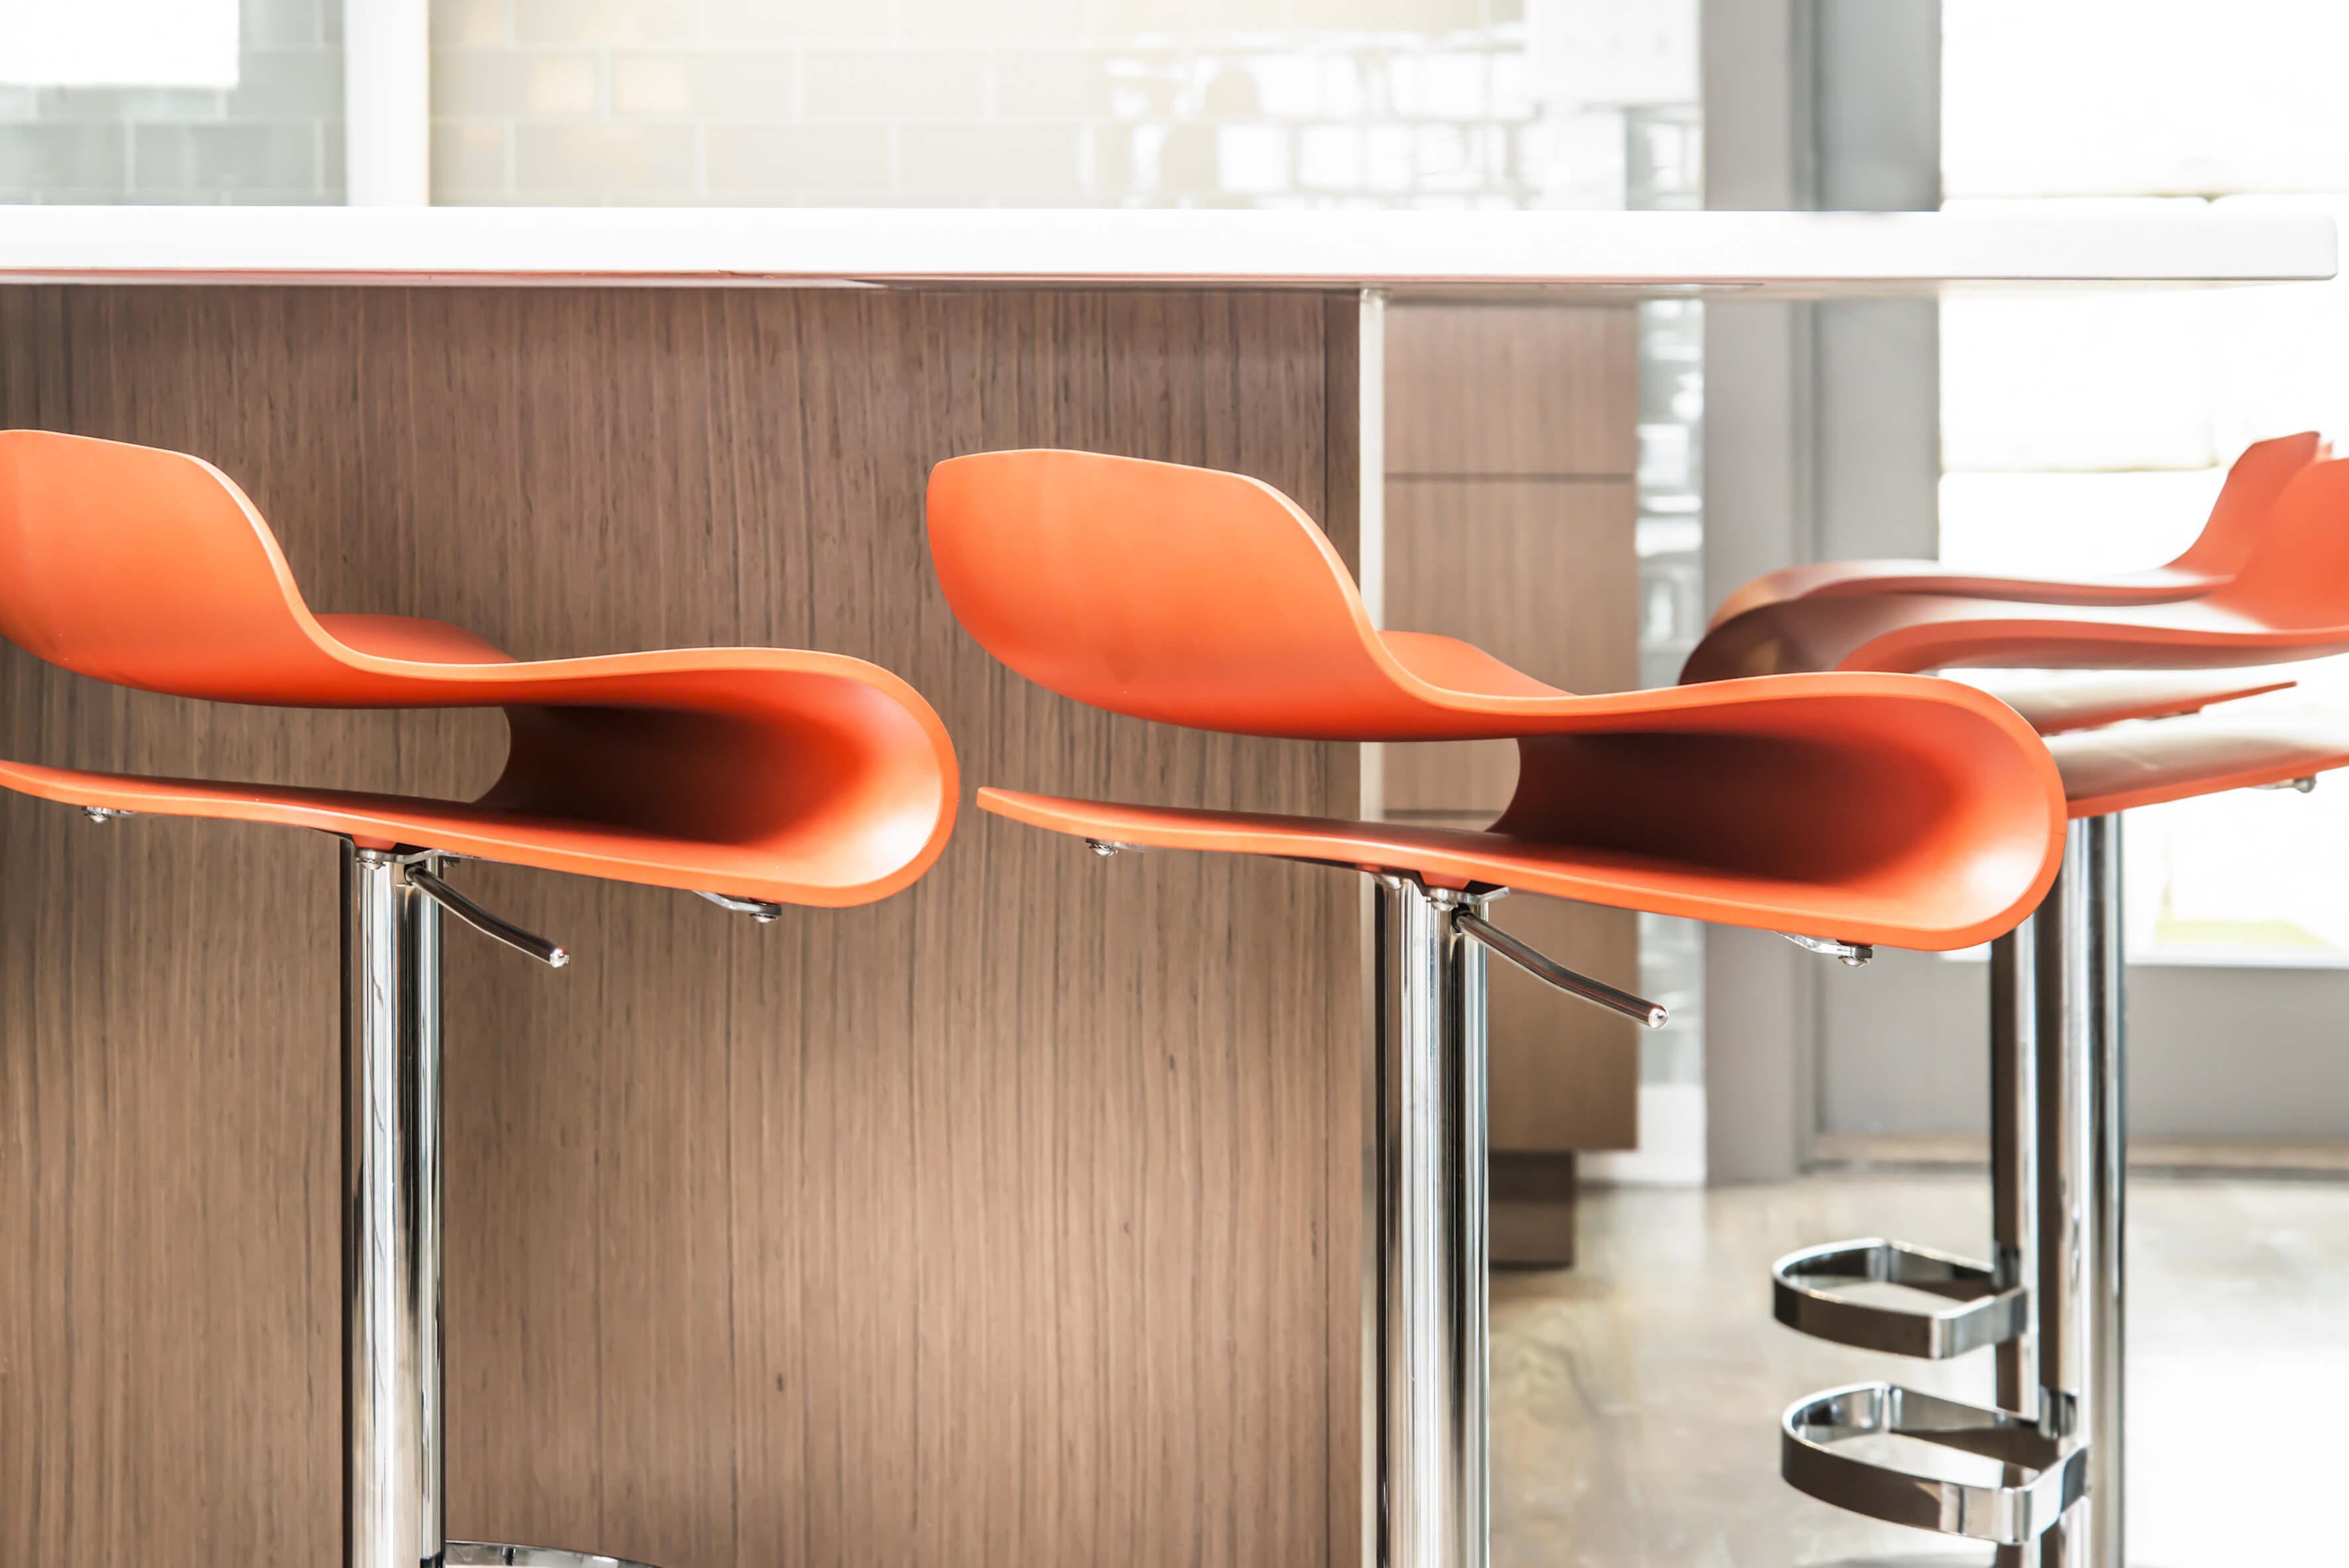 Detail shot of modern orange stools in a contemporary kitchen. Designed by Cincinnati Interior Designer, RM Interiors.